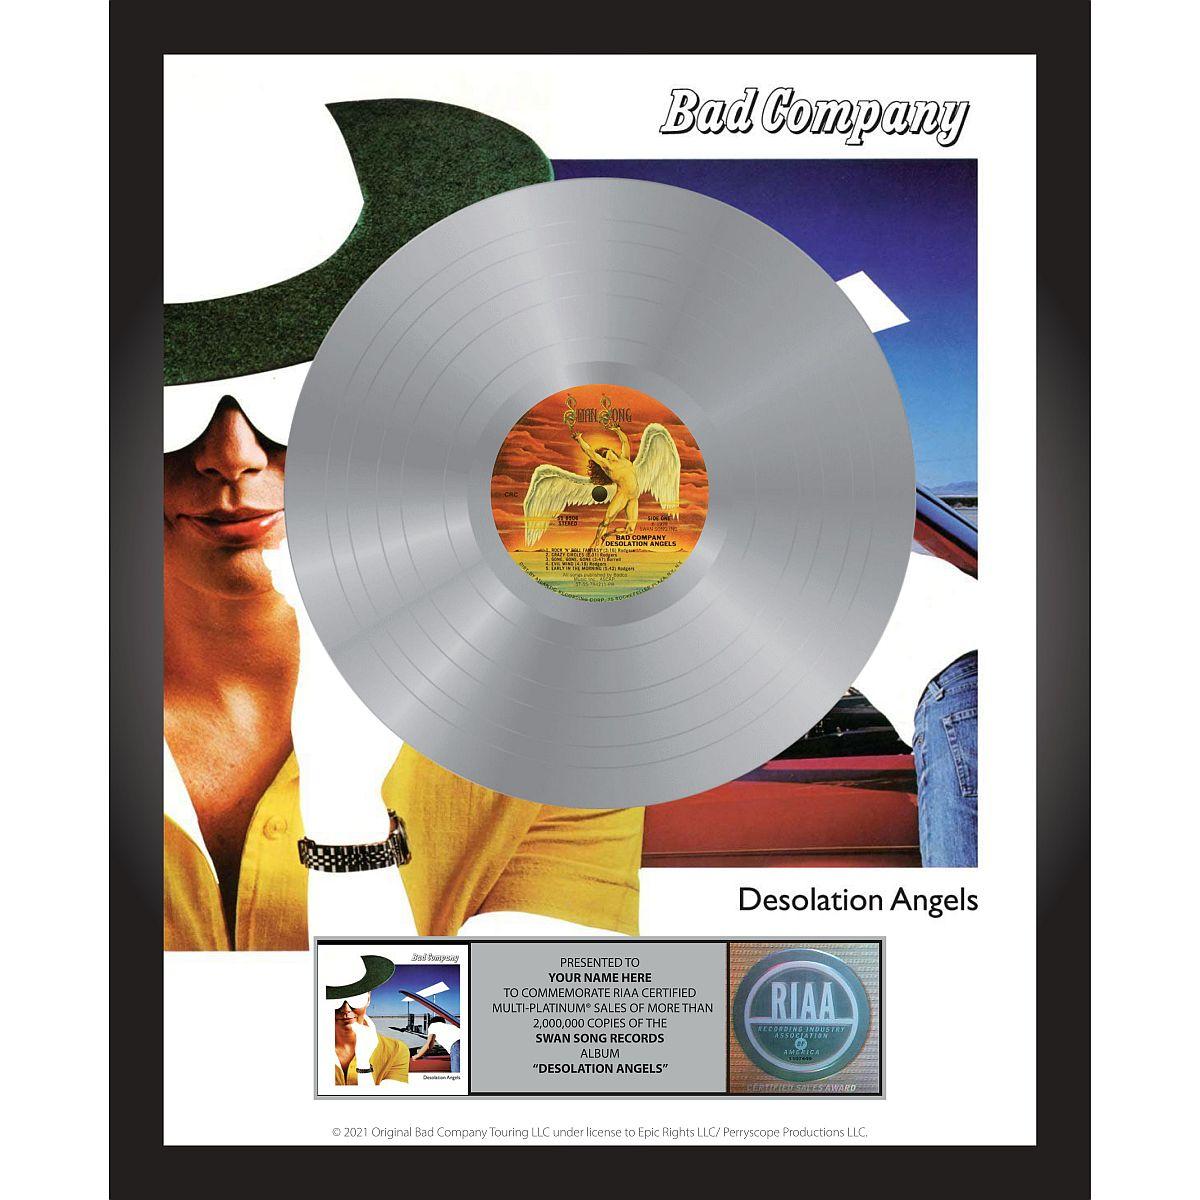 Bad Company Desolation Angels Personalized Award Plaque